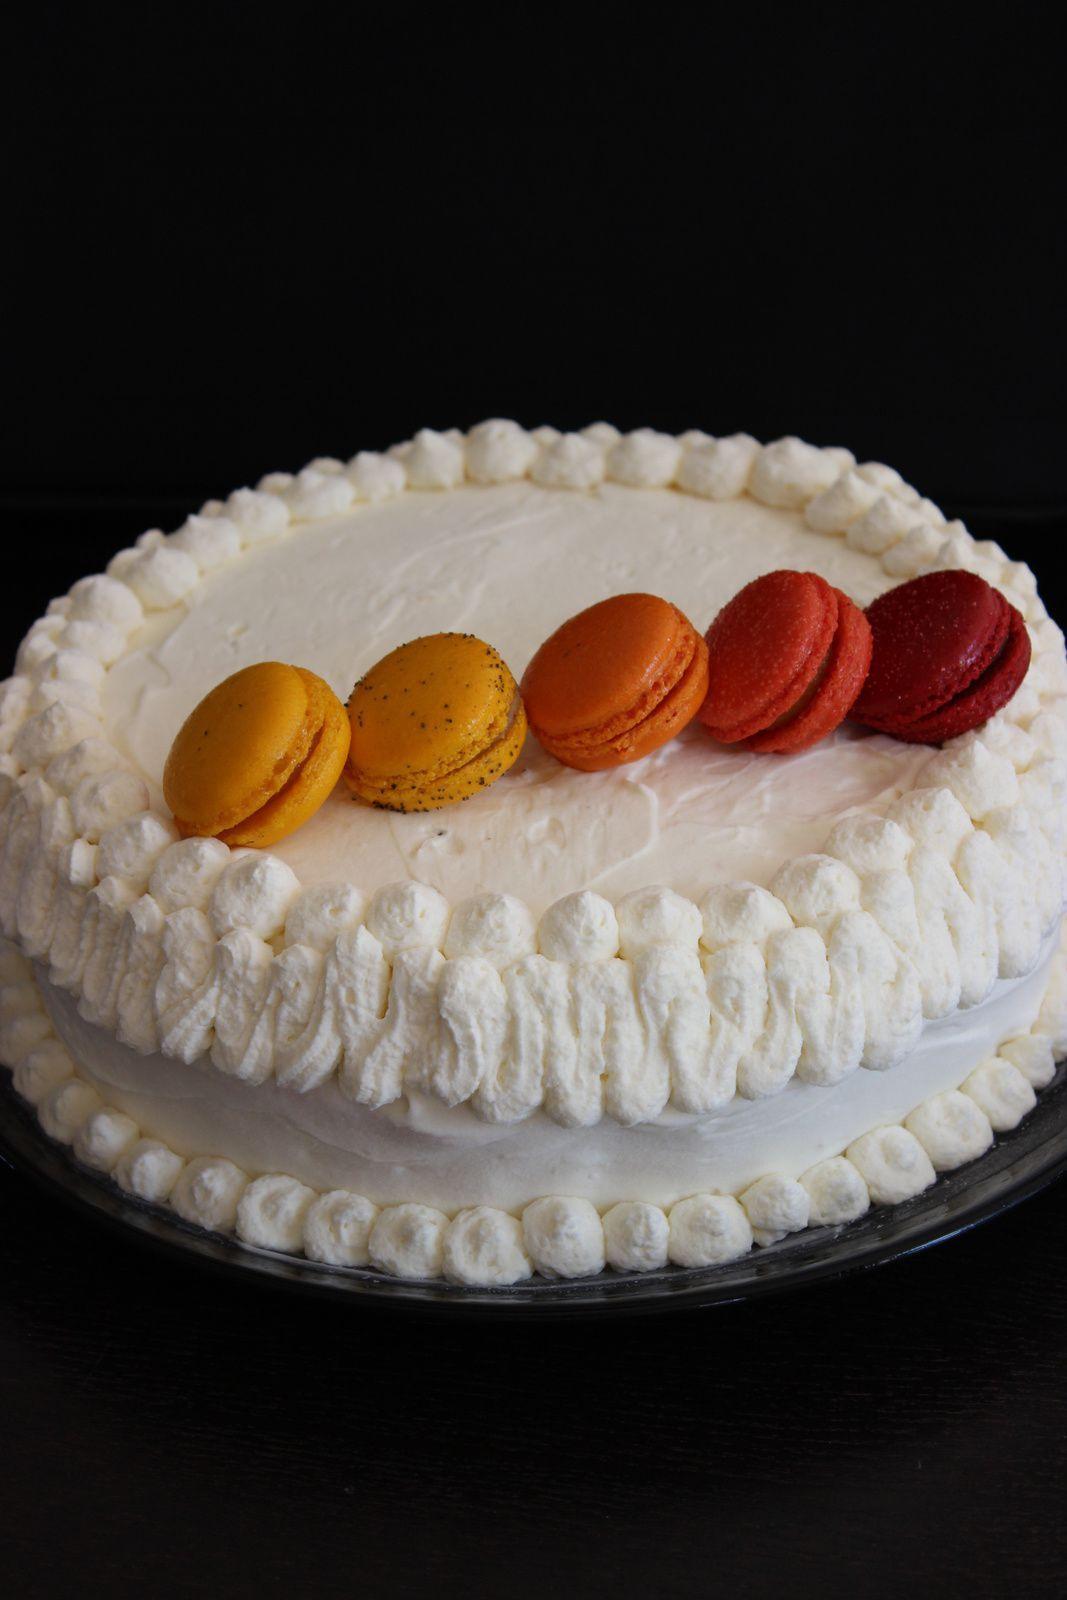 Vacherin glacé vanille framboises chantilly mascarpone - Sladoled torta